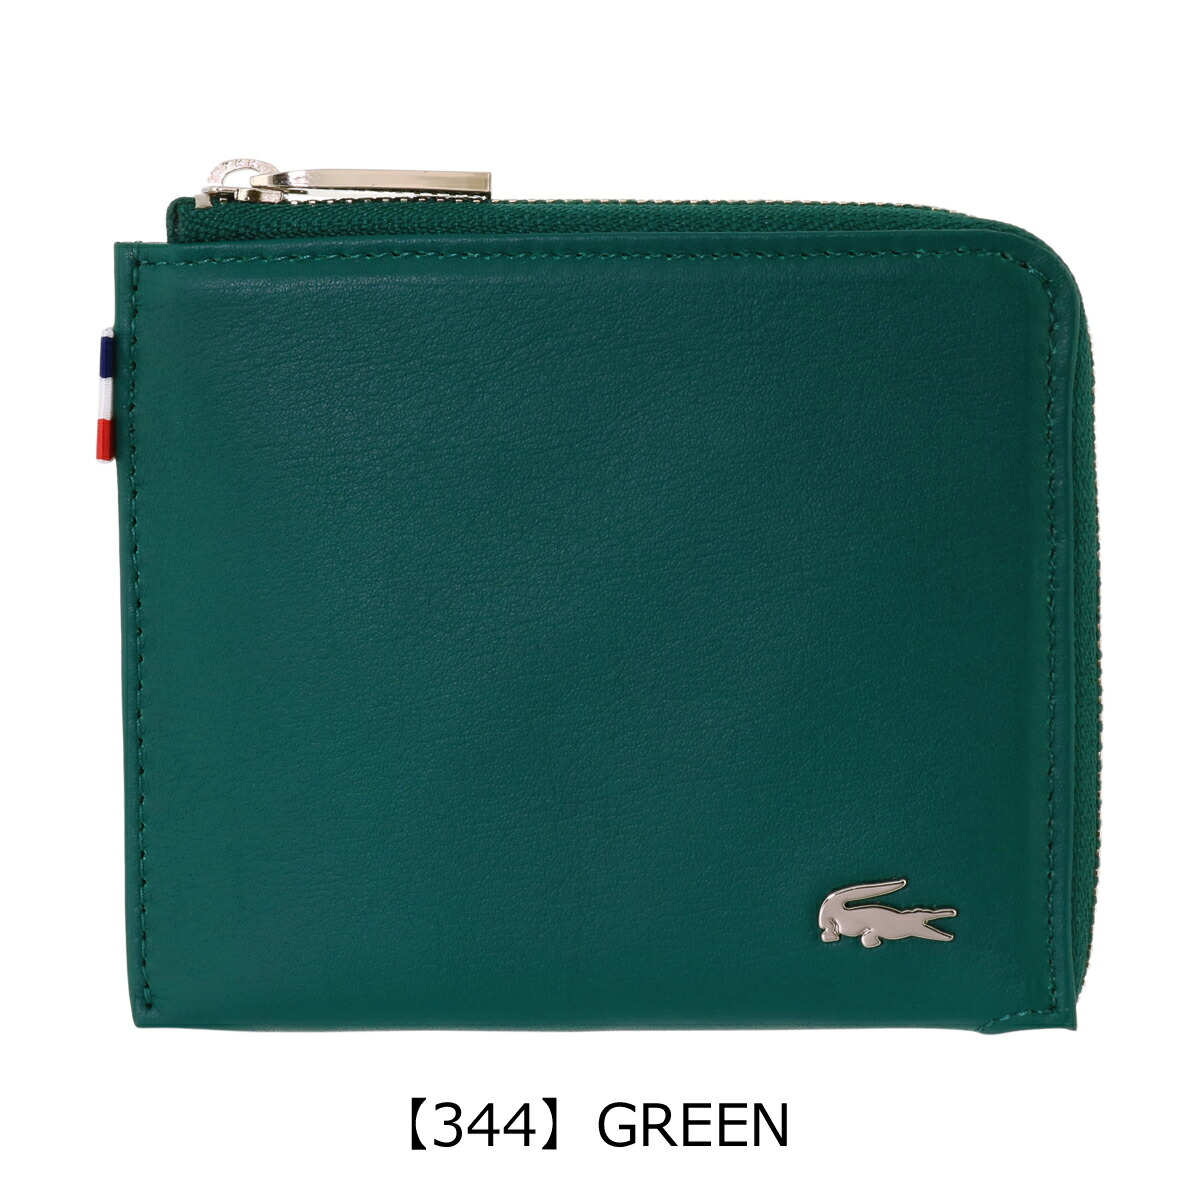 【344】GREEN